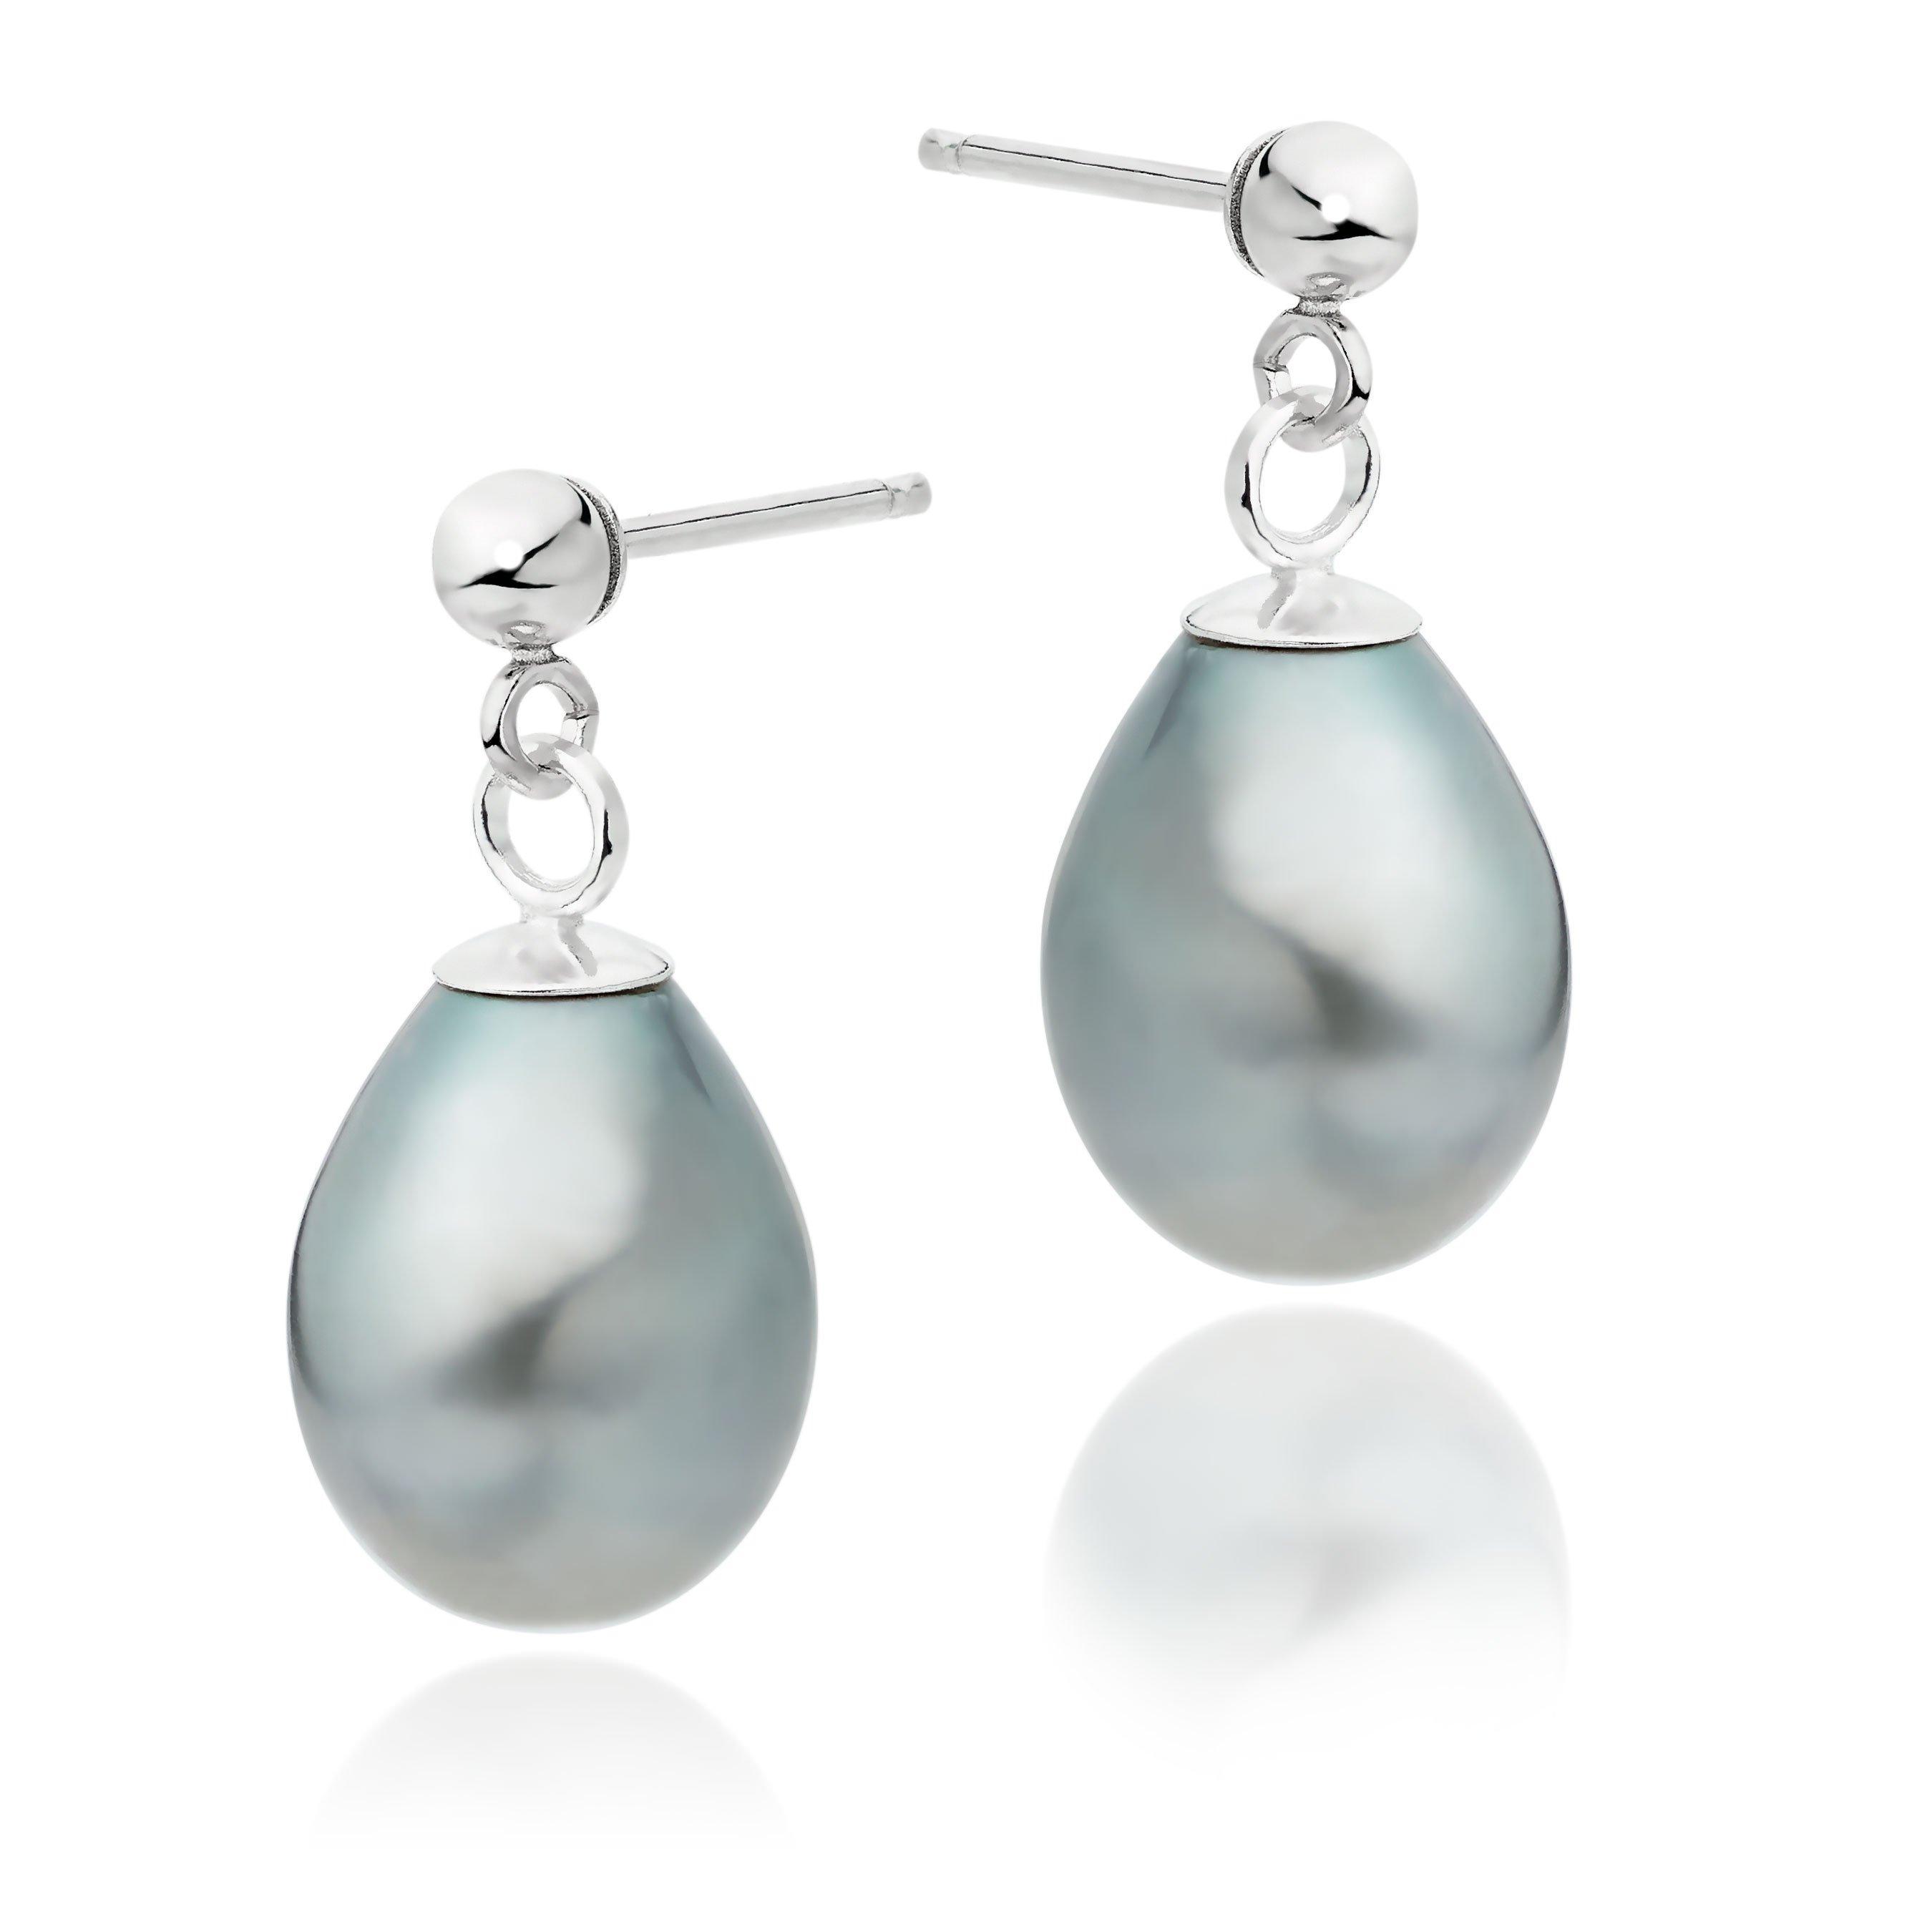 Silver Freshwater Cultured Grey Pearl Drop Earrings